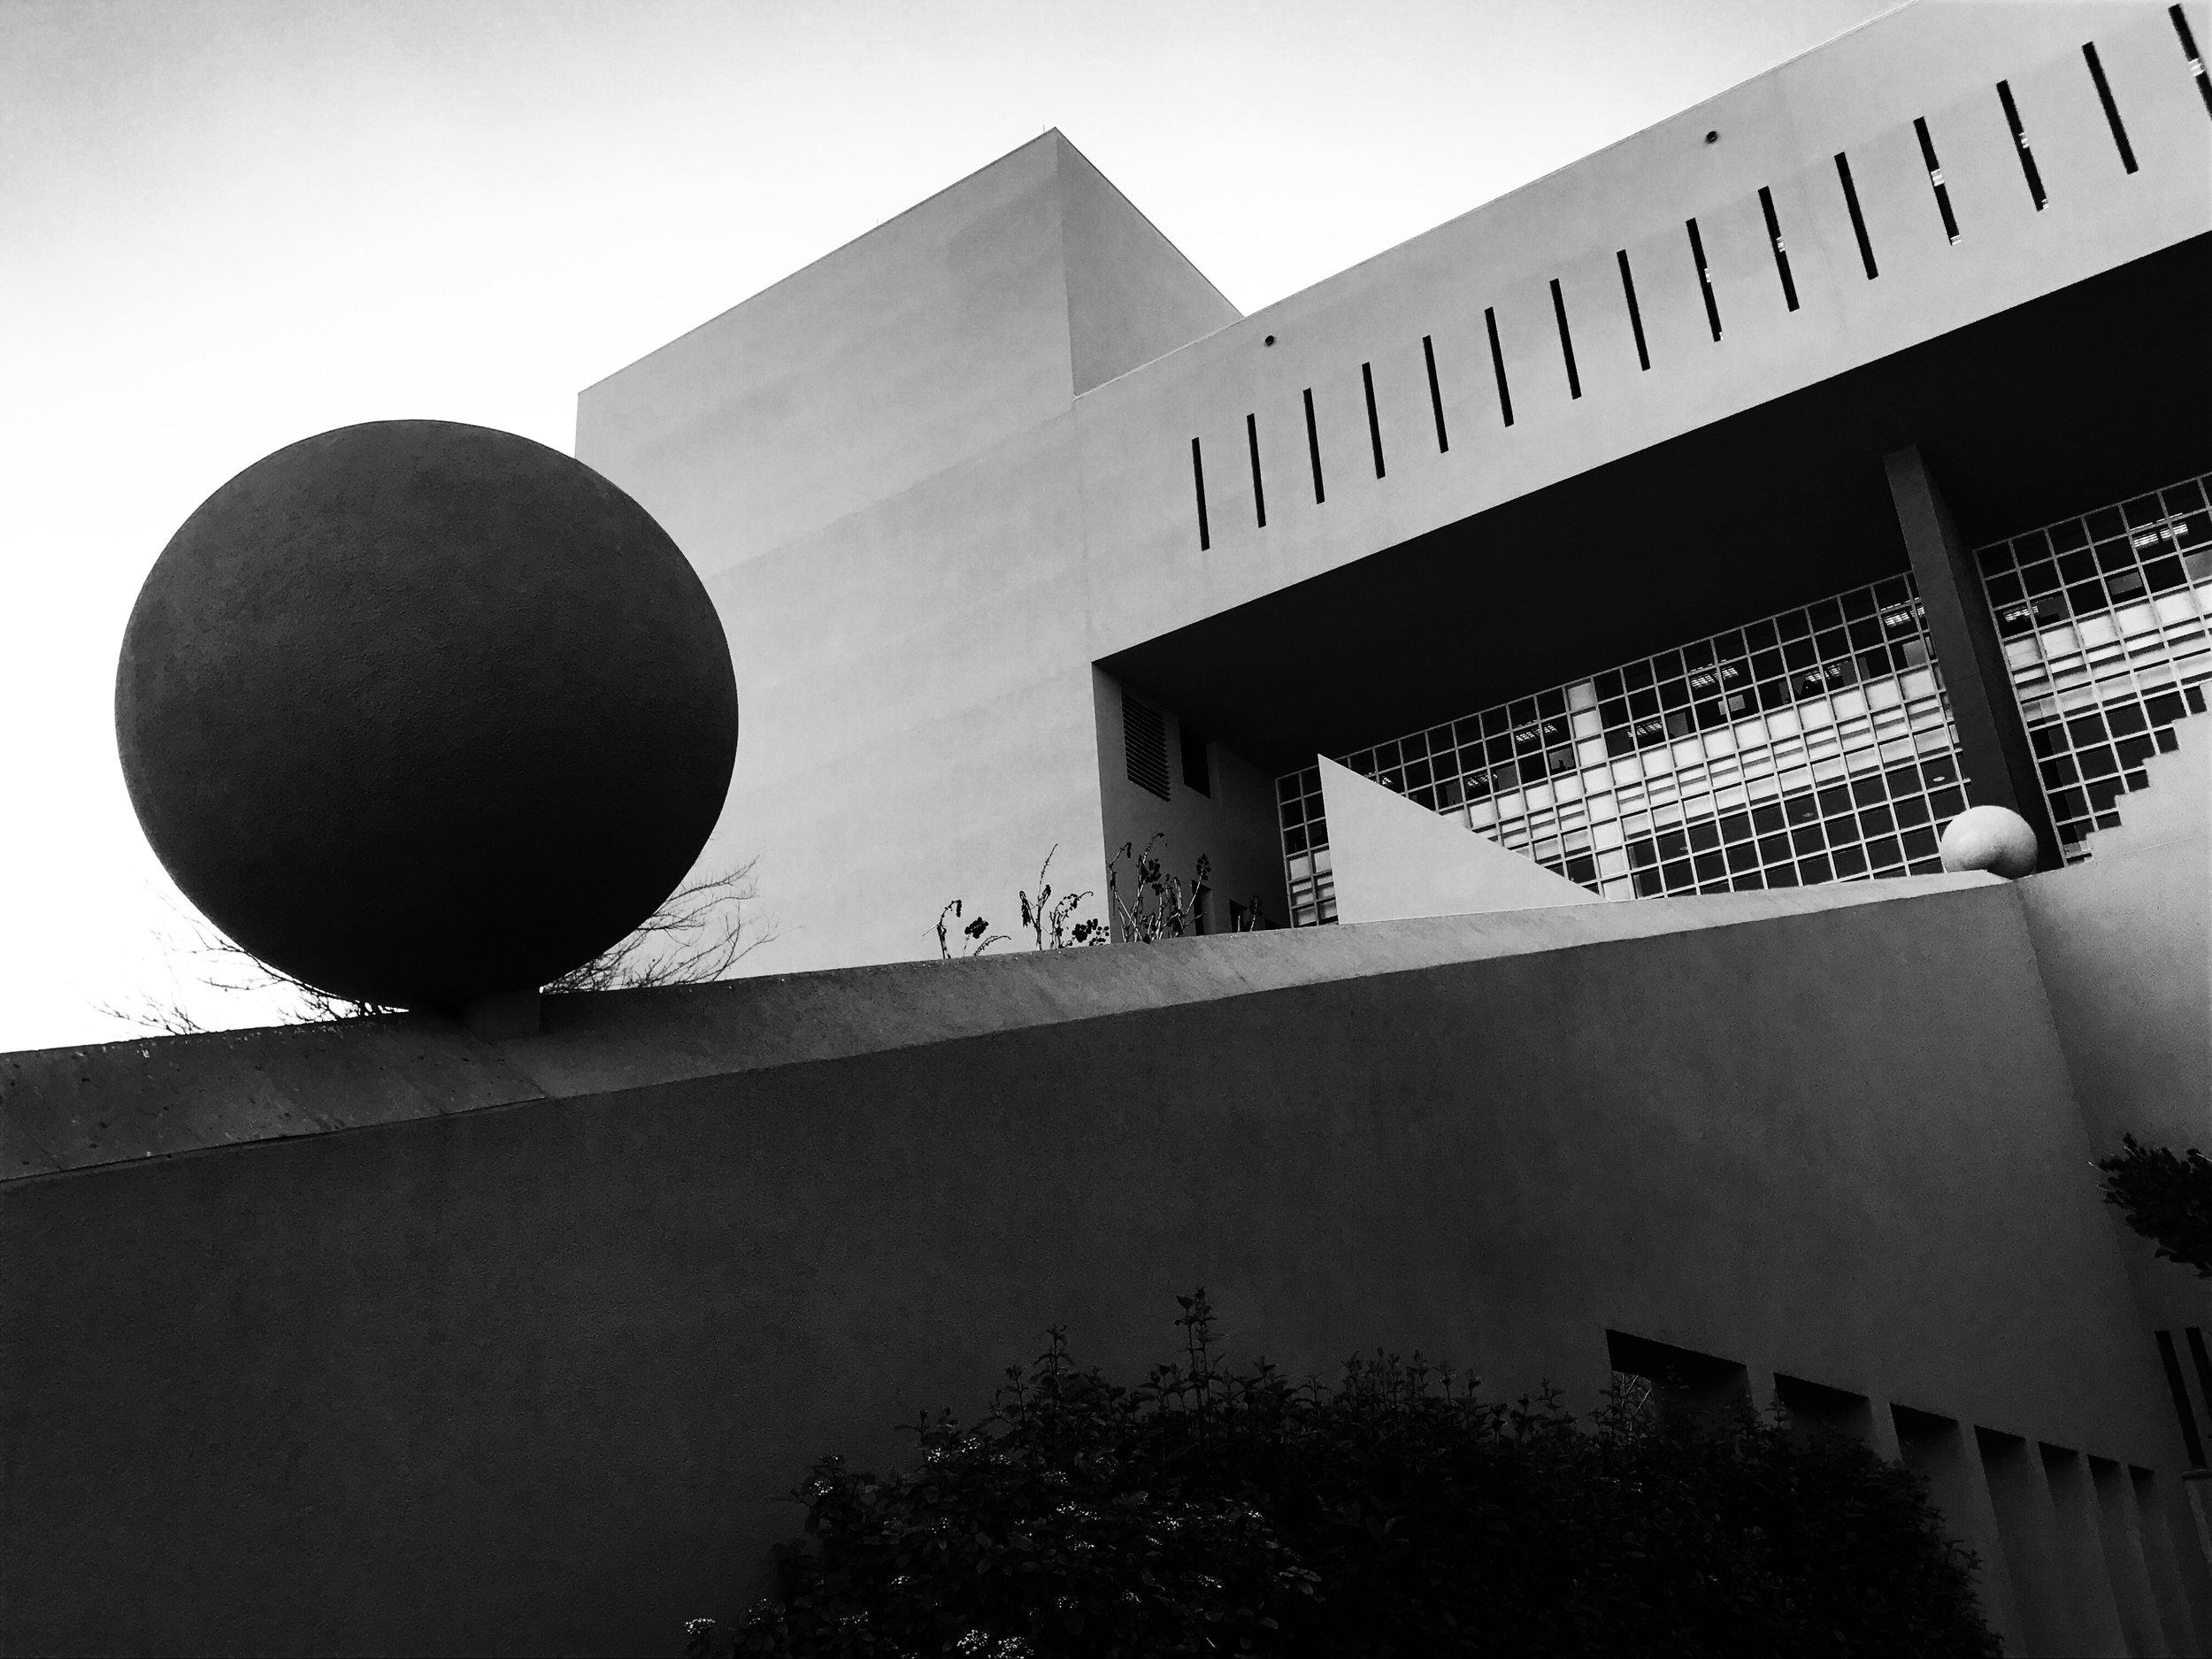 architecture_photography_fabian_villa_1